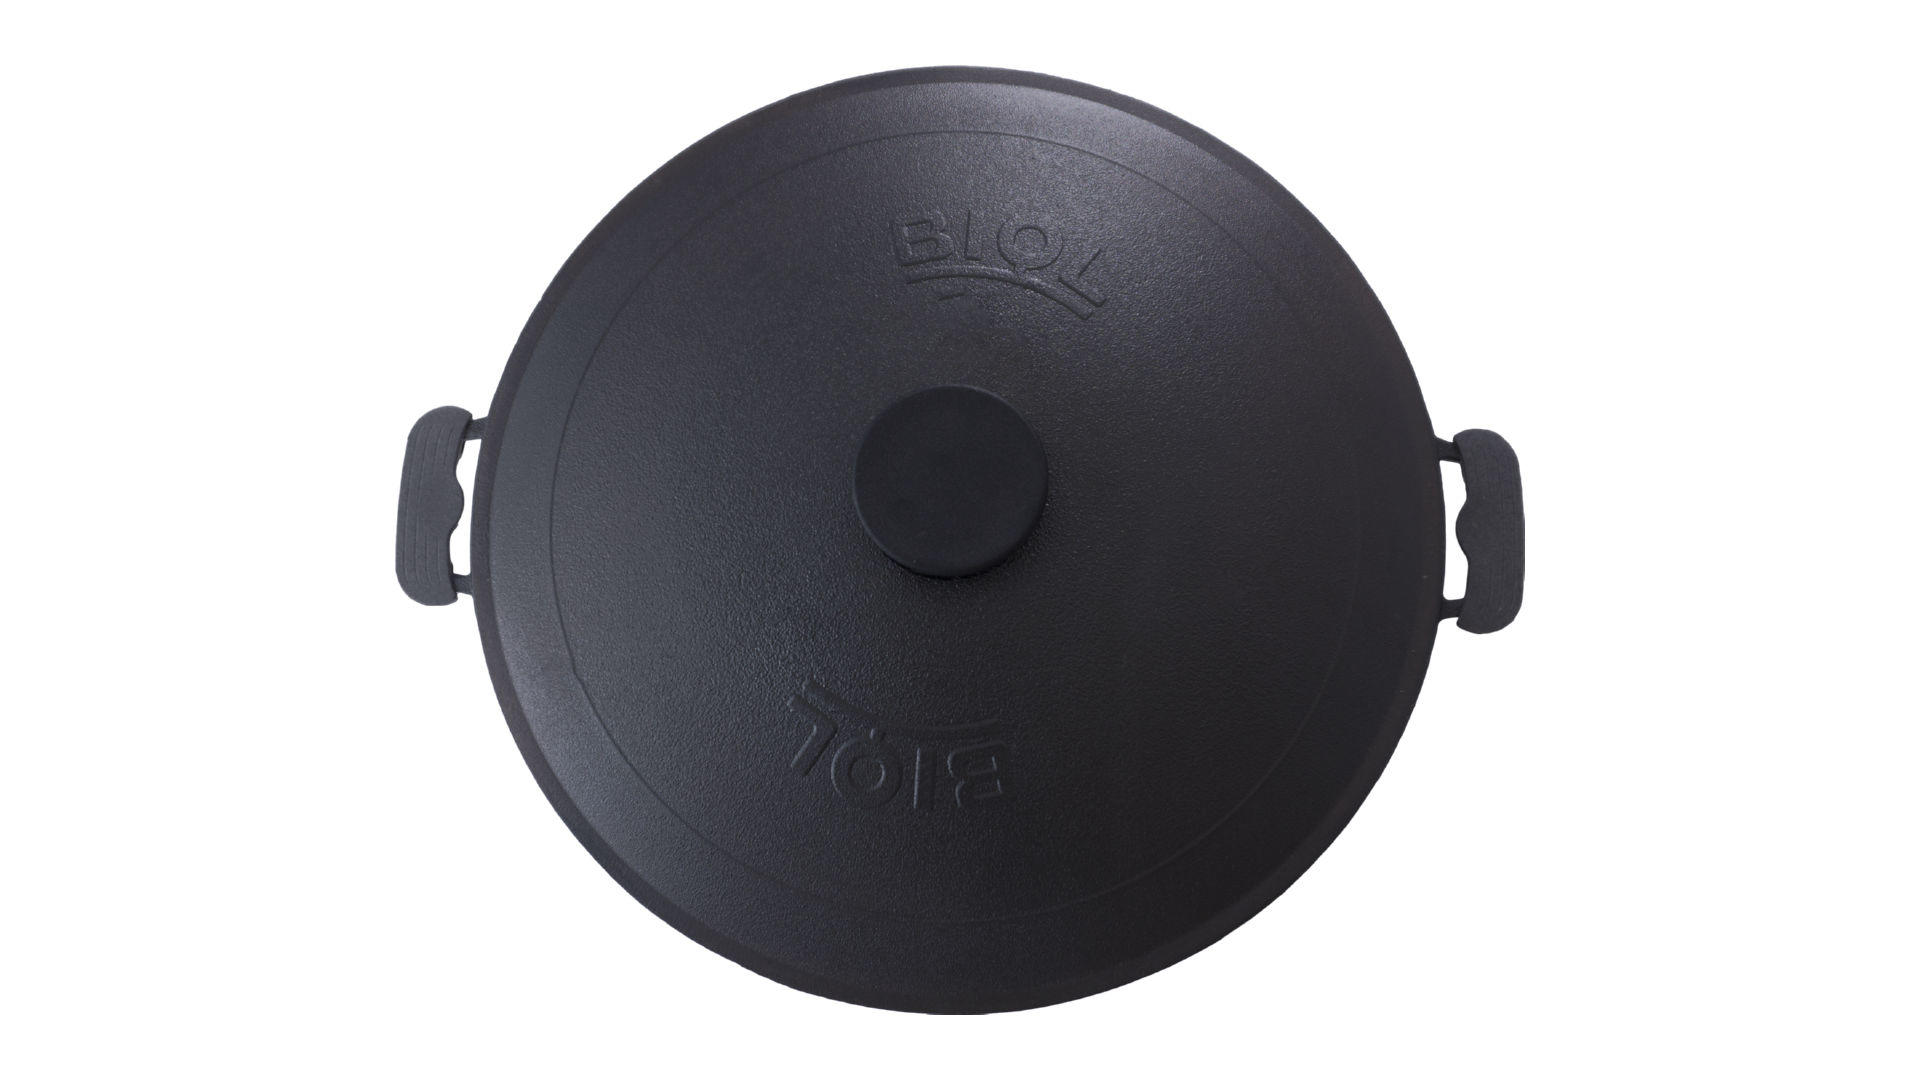 Сковорода жаровня чугунная Biol - 400 мм с крышкой 5